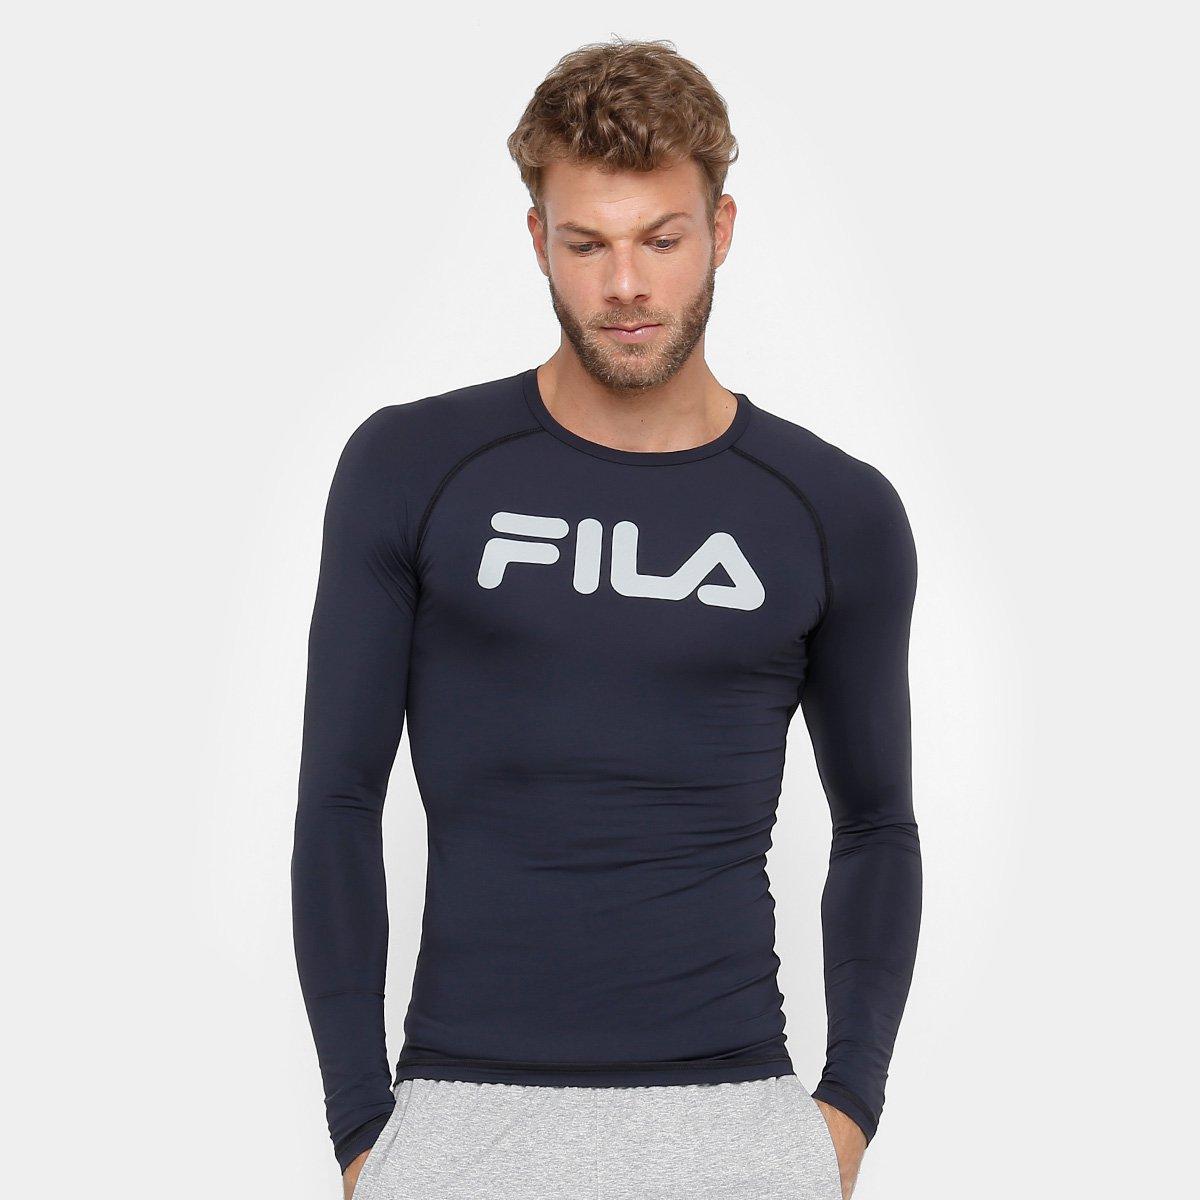 Camiseta Fila Step Ns Manga Longa Masculina - Compre Agora  8b623a04f6637